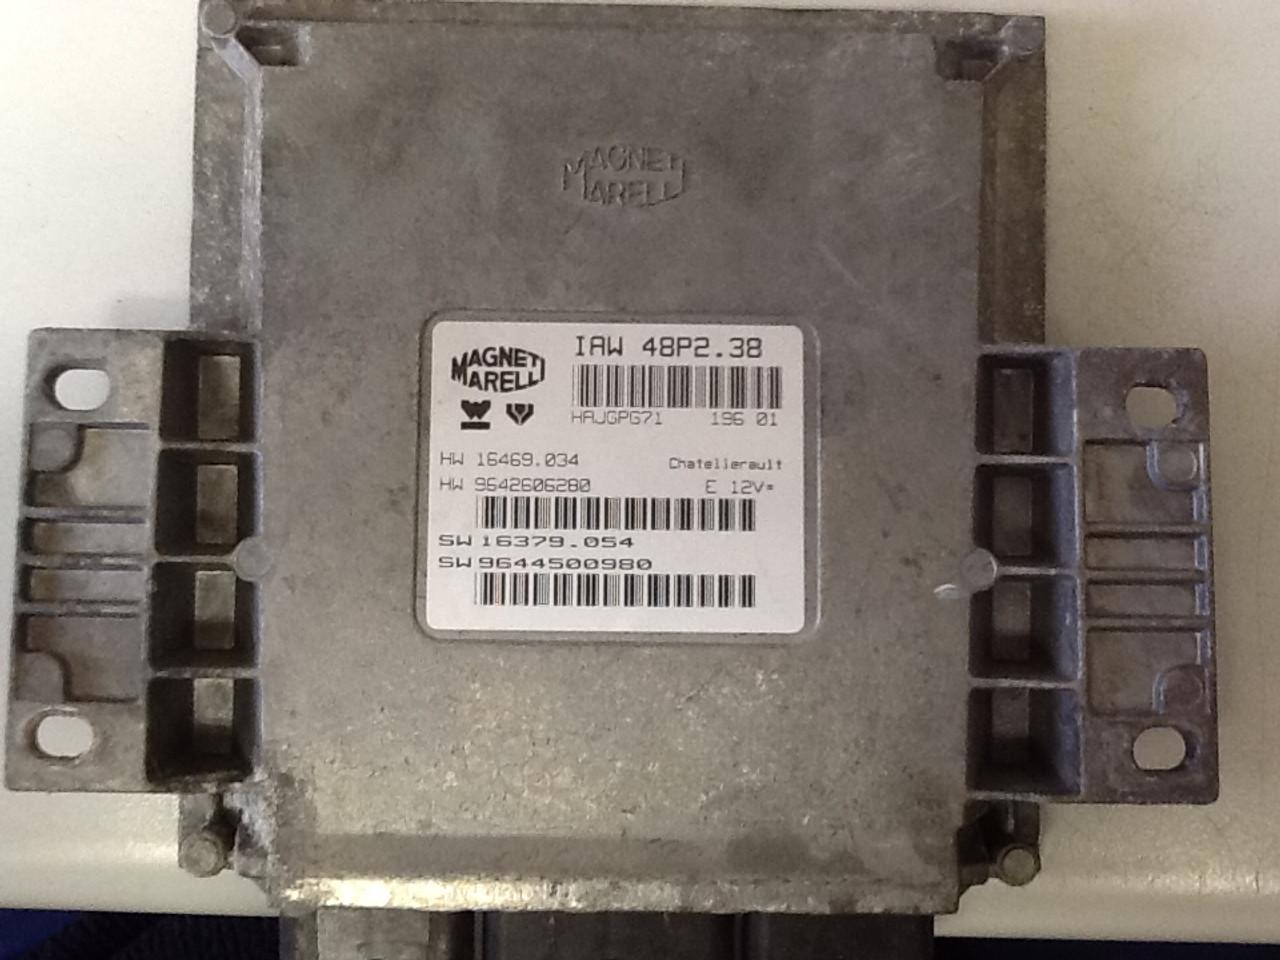 Magneti Marelli, IAW 48P2.38, HW 16469.034, HW 9642606280, SW 16379.054, SW 9644500980